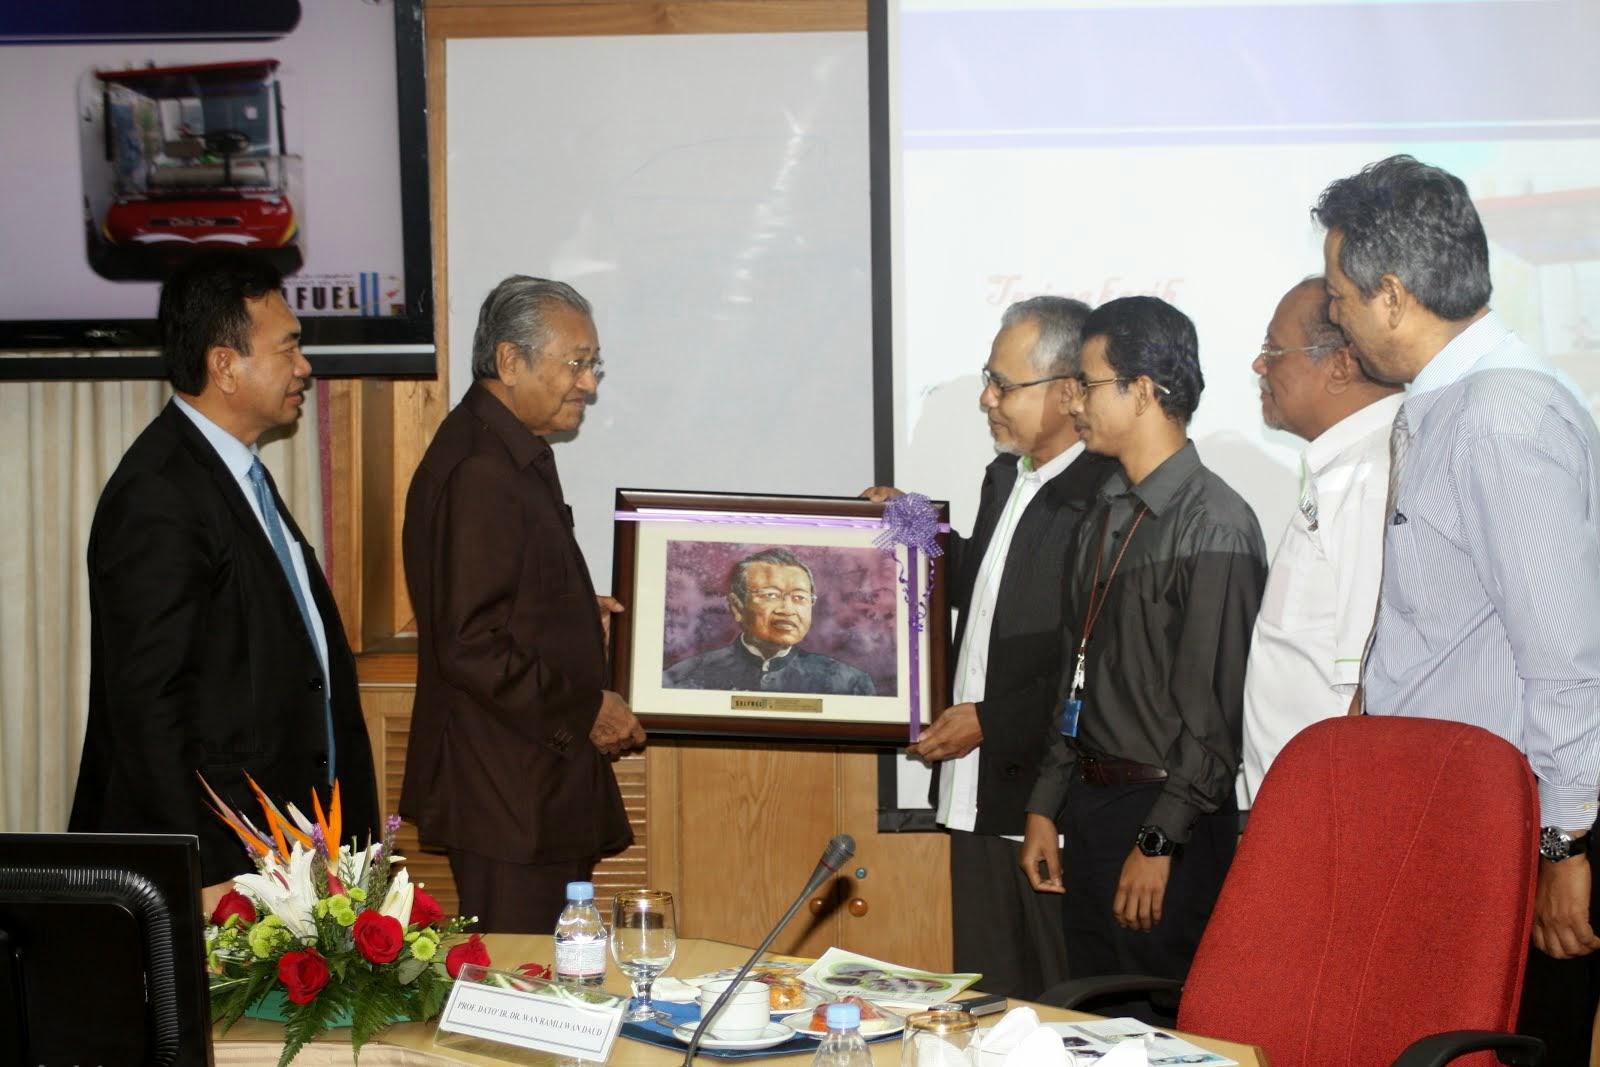 Potret Tun. Dr. Mahathir bin Mohamad